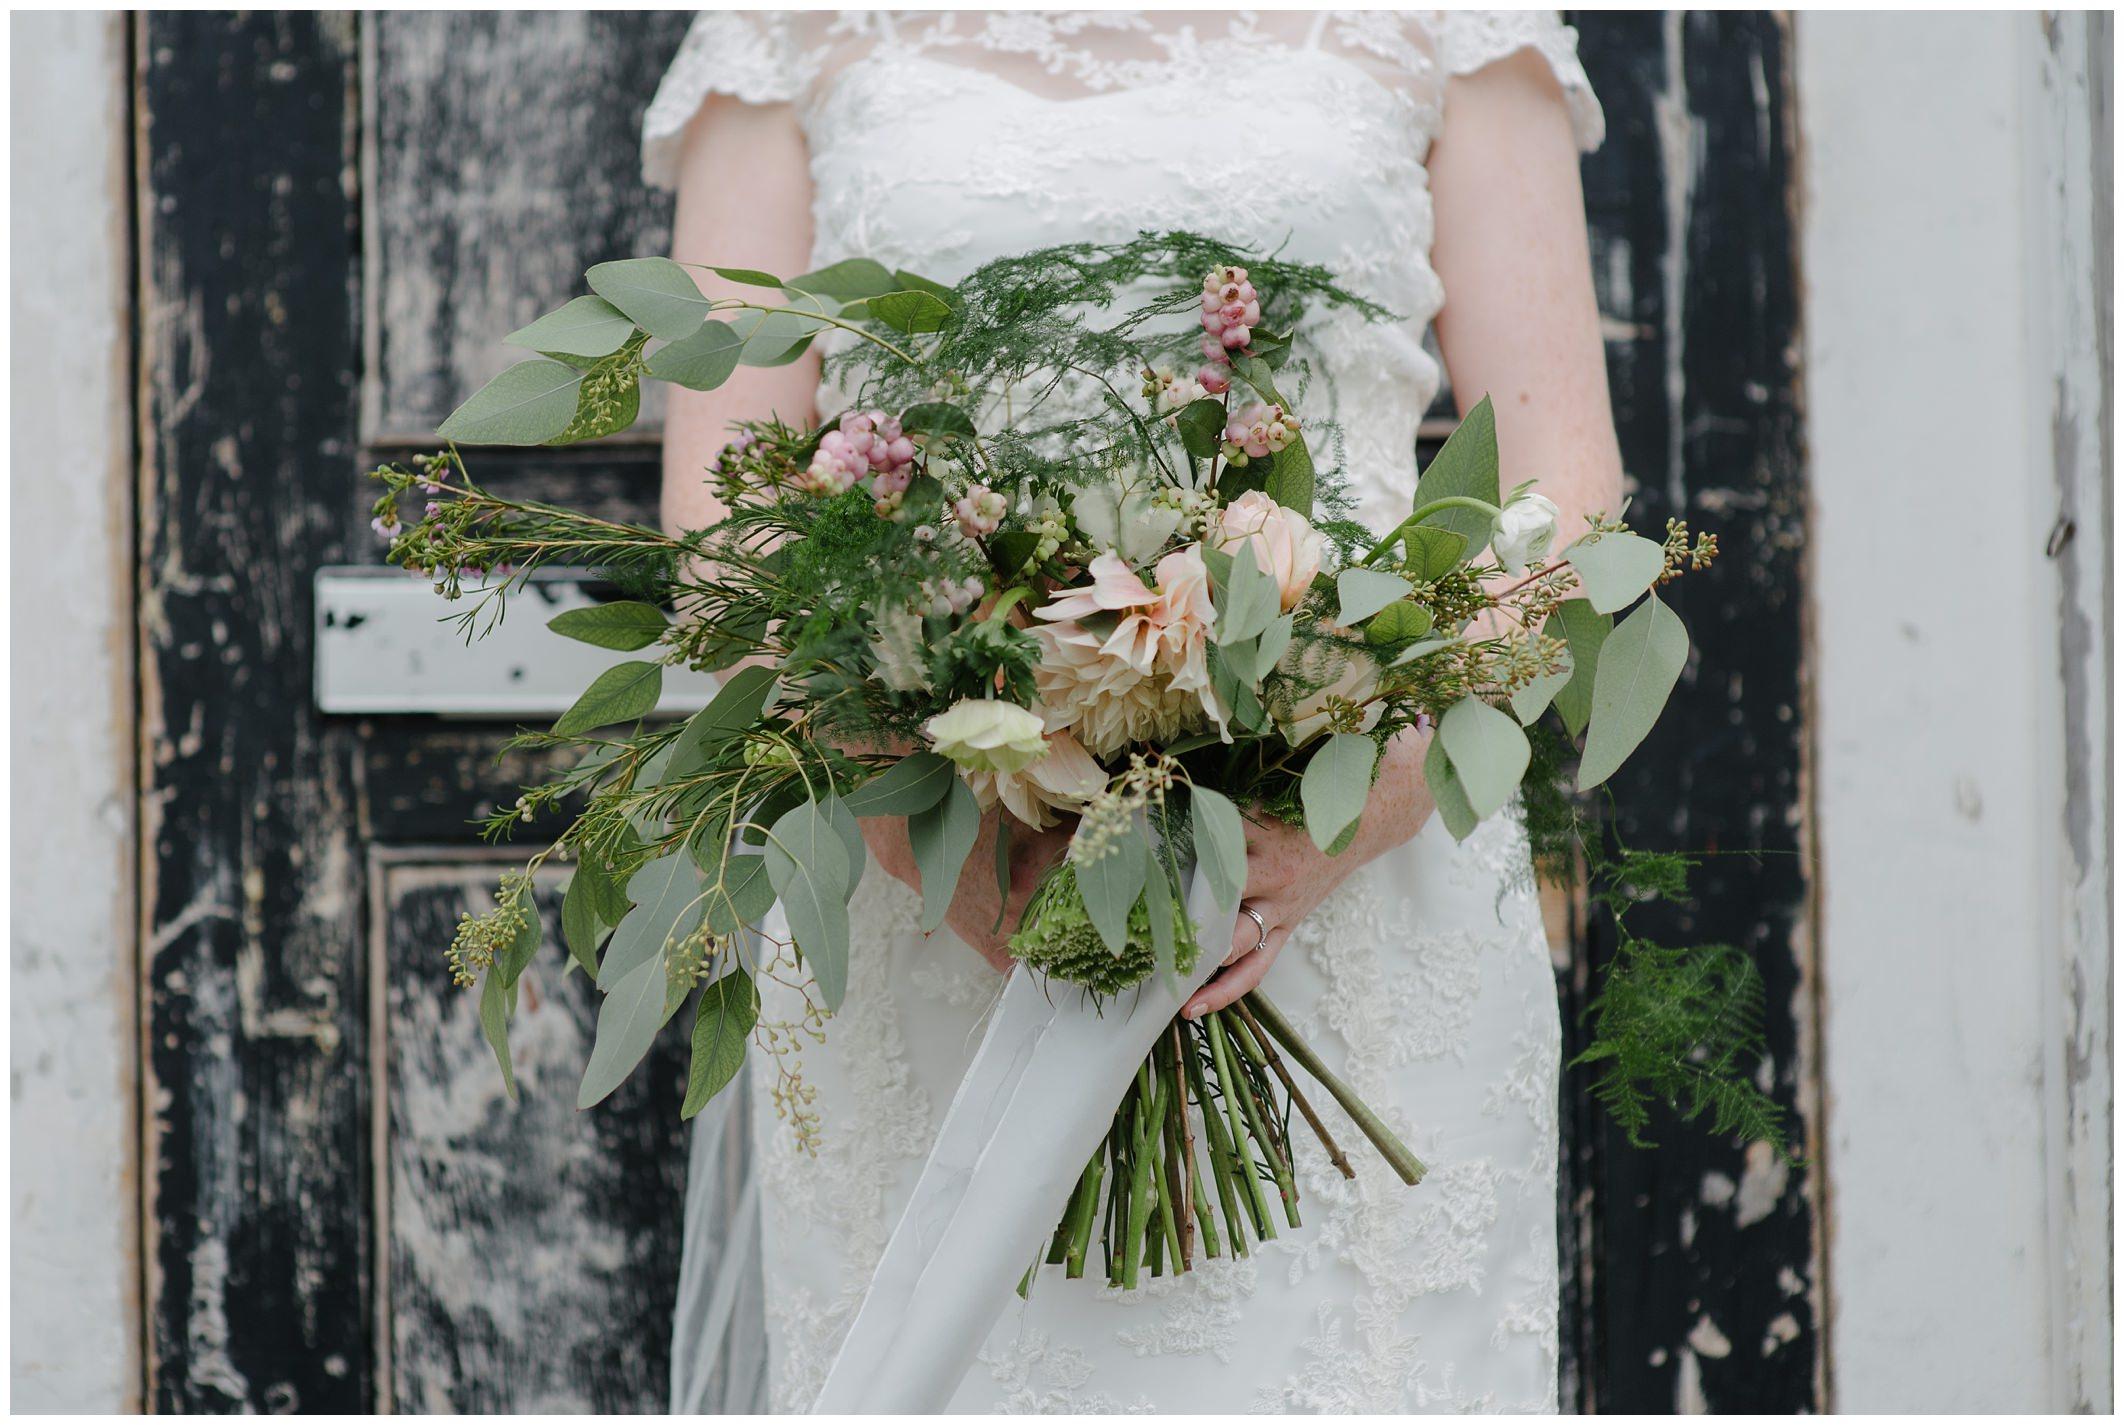 asylum_chapel_peckham_rosendale_wedding_jude_browne_photography_0081.jpg